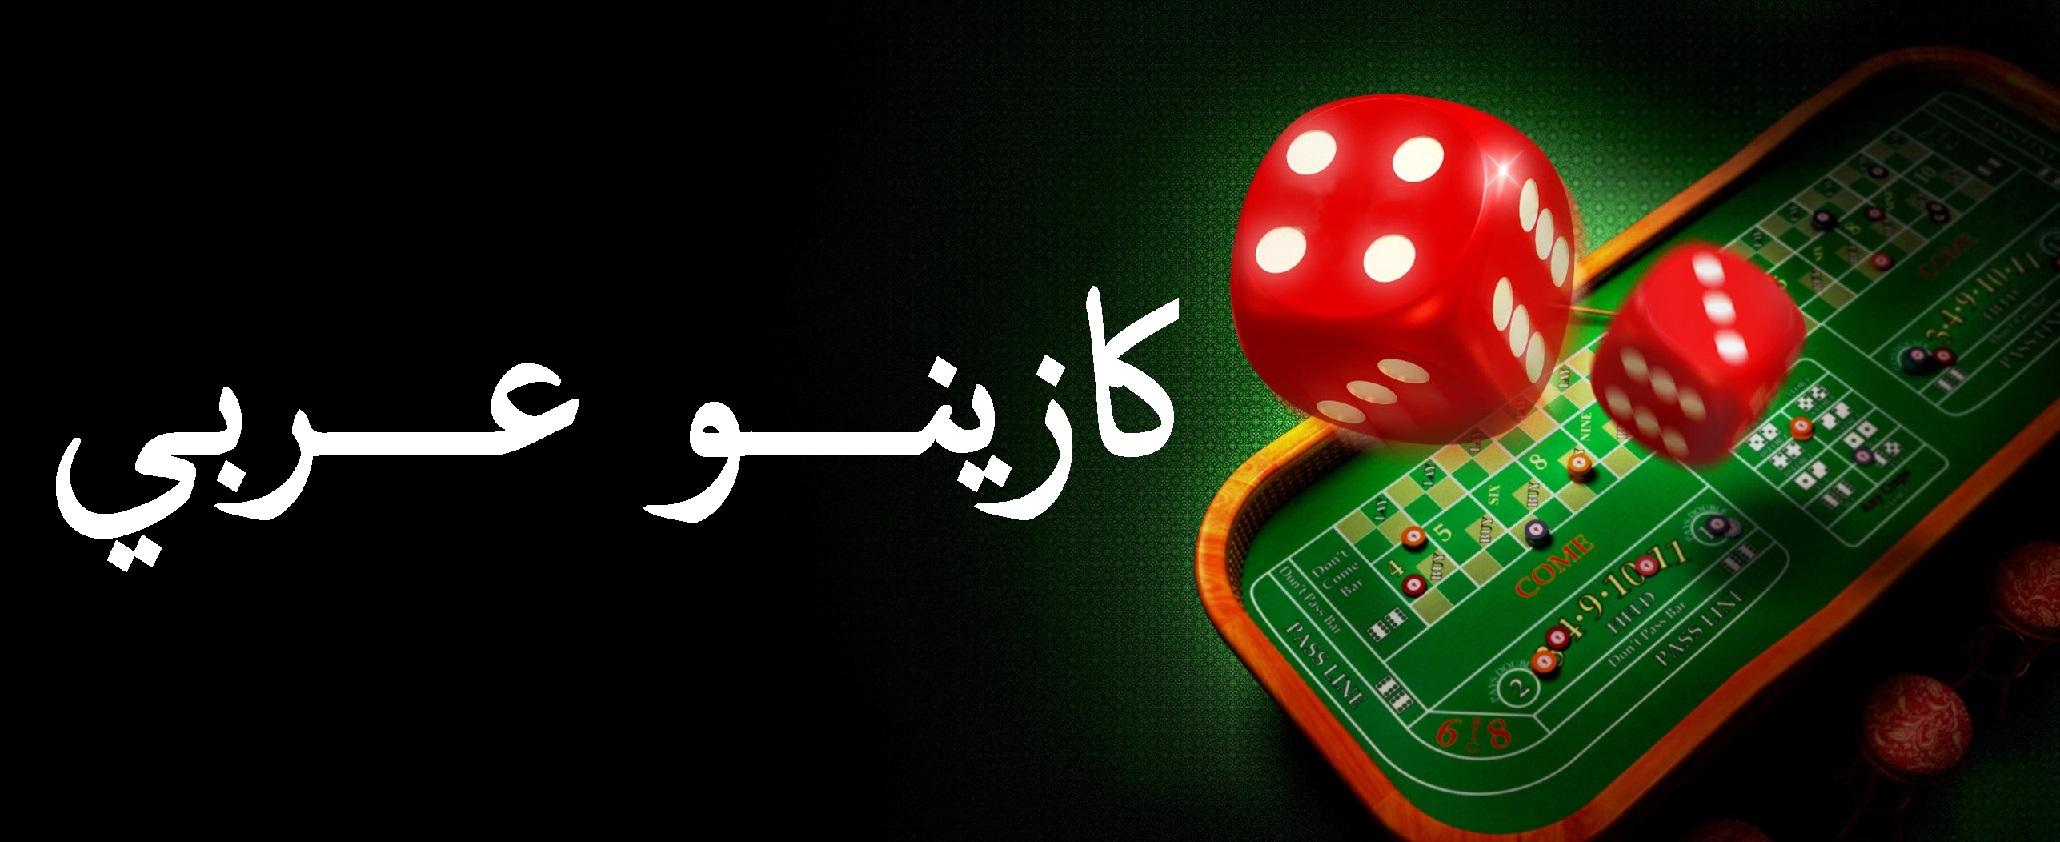 افضل لاعب قمار - 57587